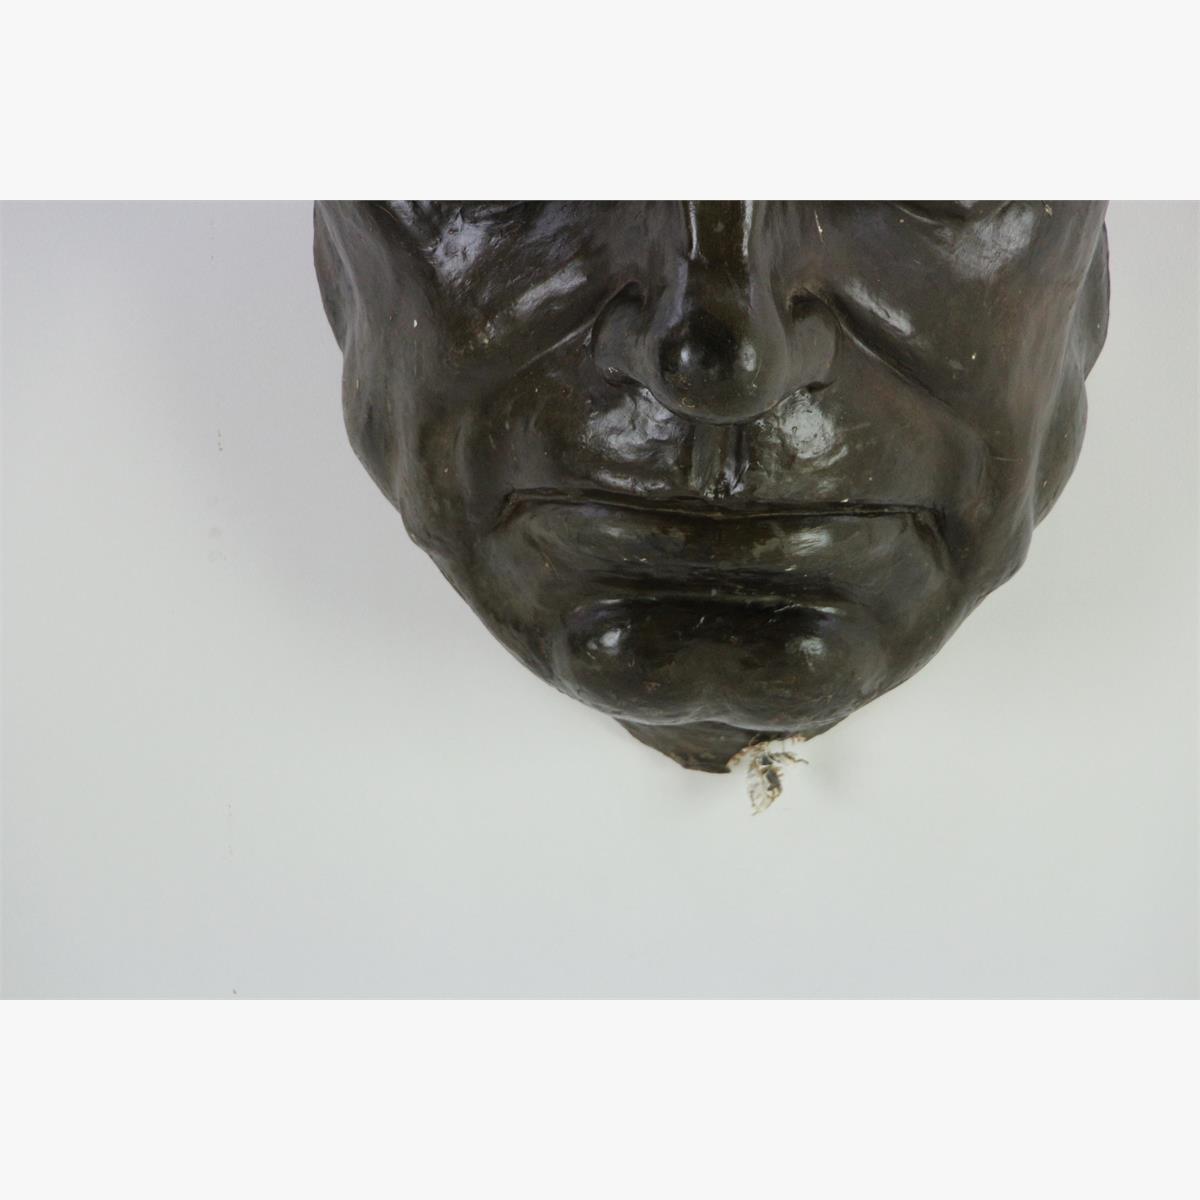 Afbeeldingen van Groot antiek hoofd uit de oudheid in plaaster